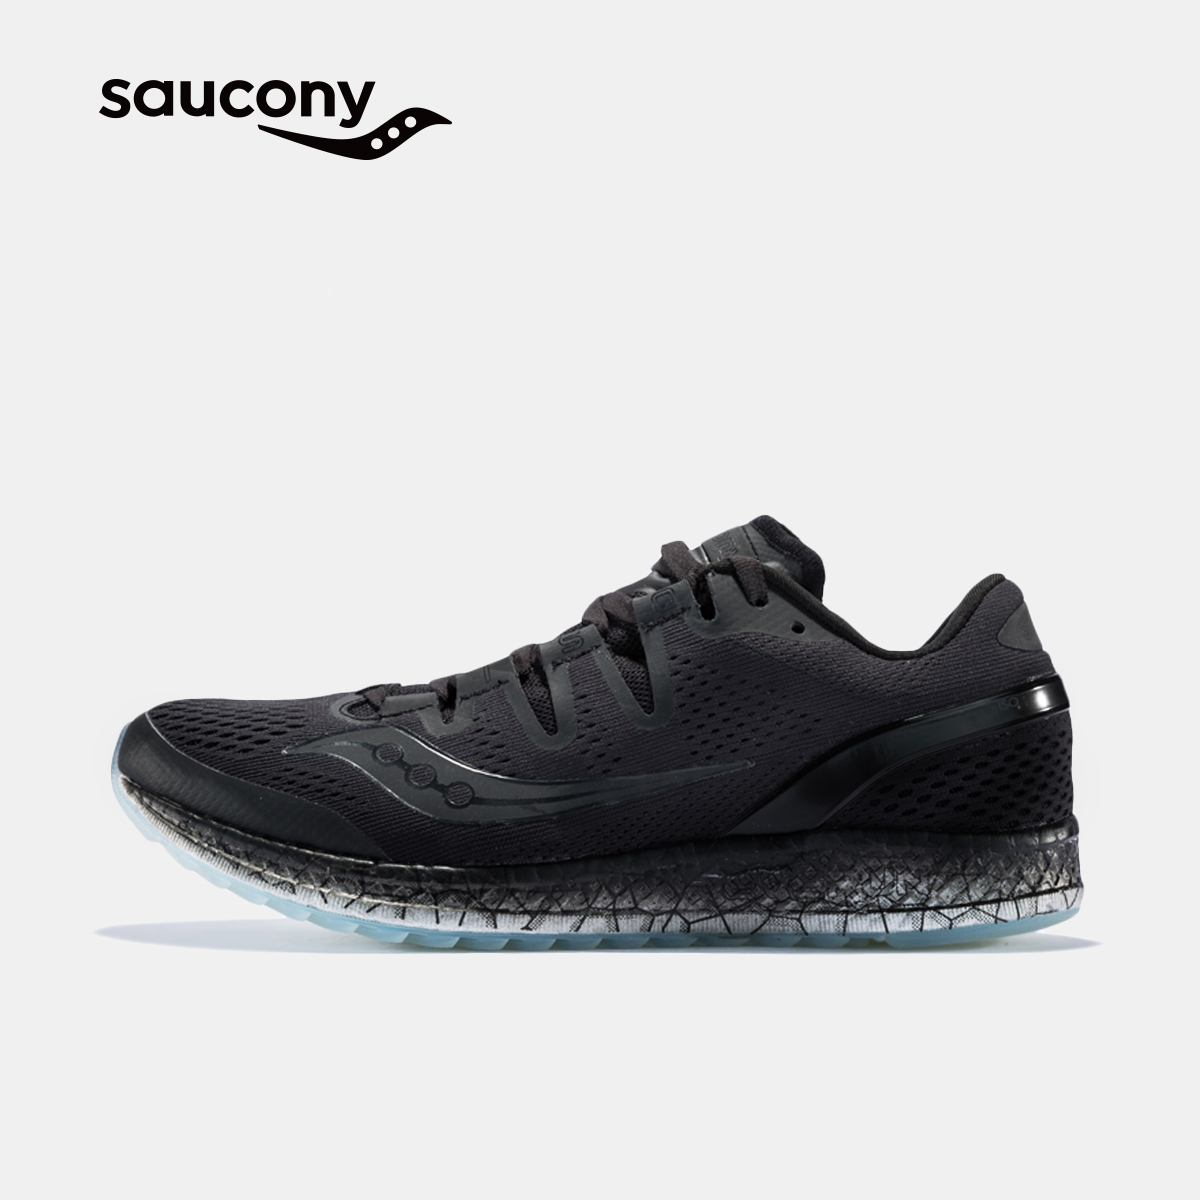 Saucony圣康尼FREEDOM ISO中性缓震跑鞋运动鞋女子跑步鞋S10355